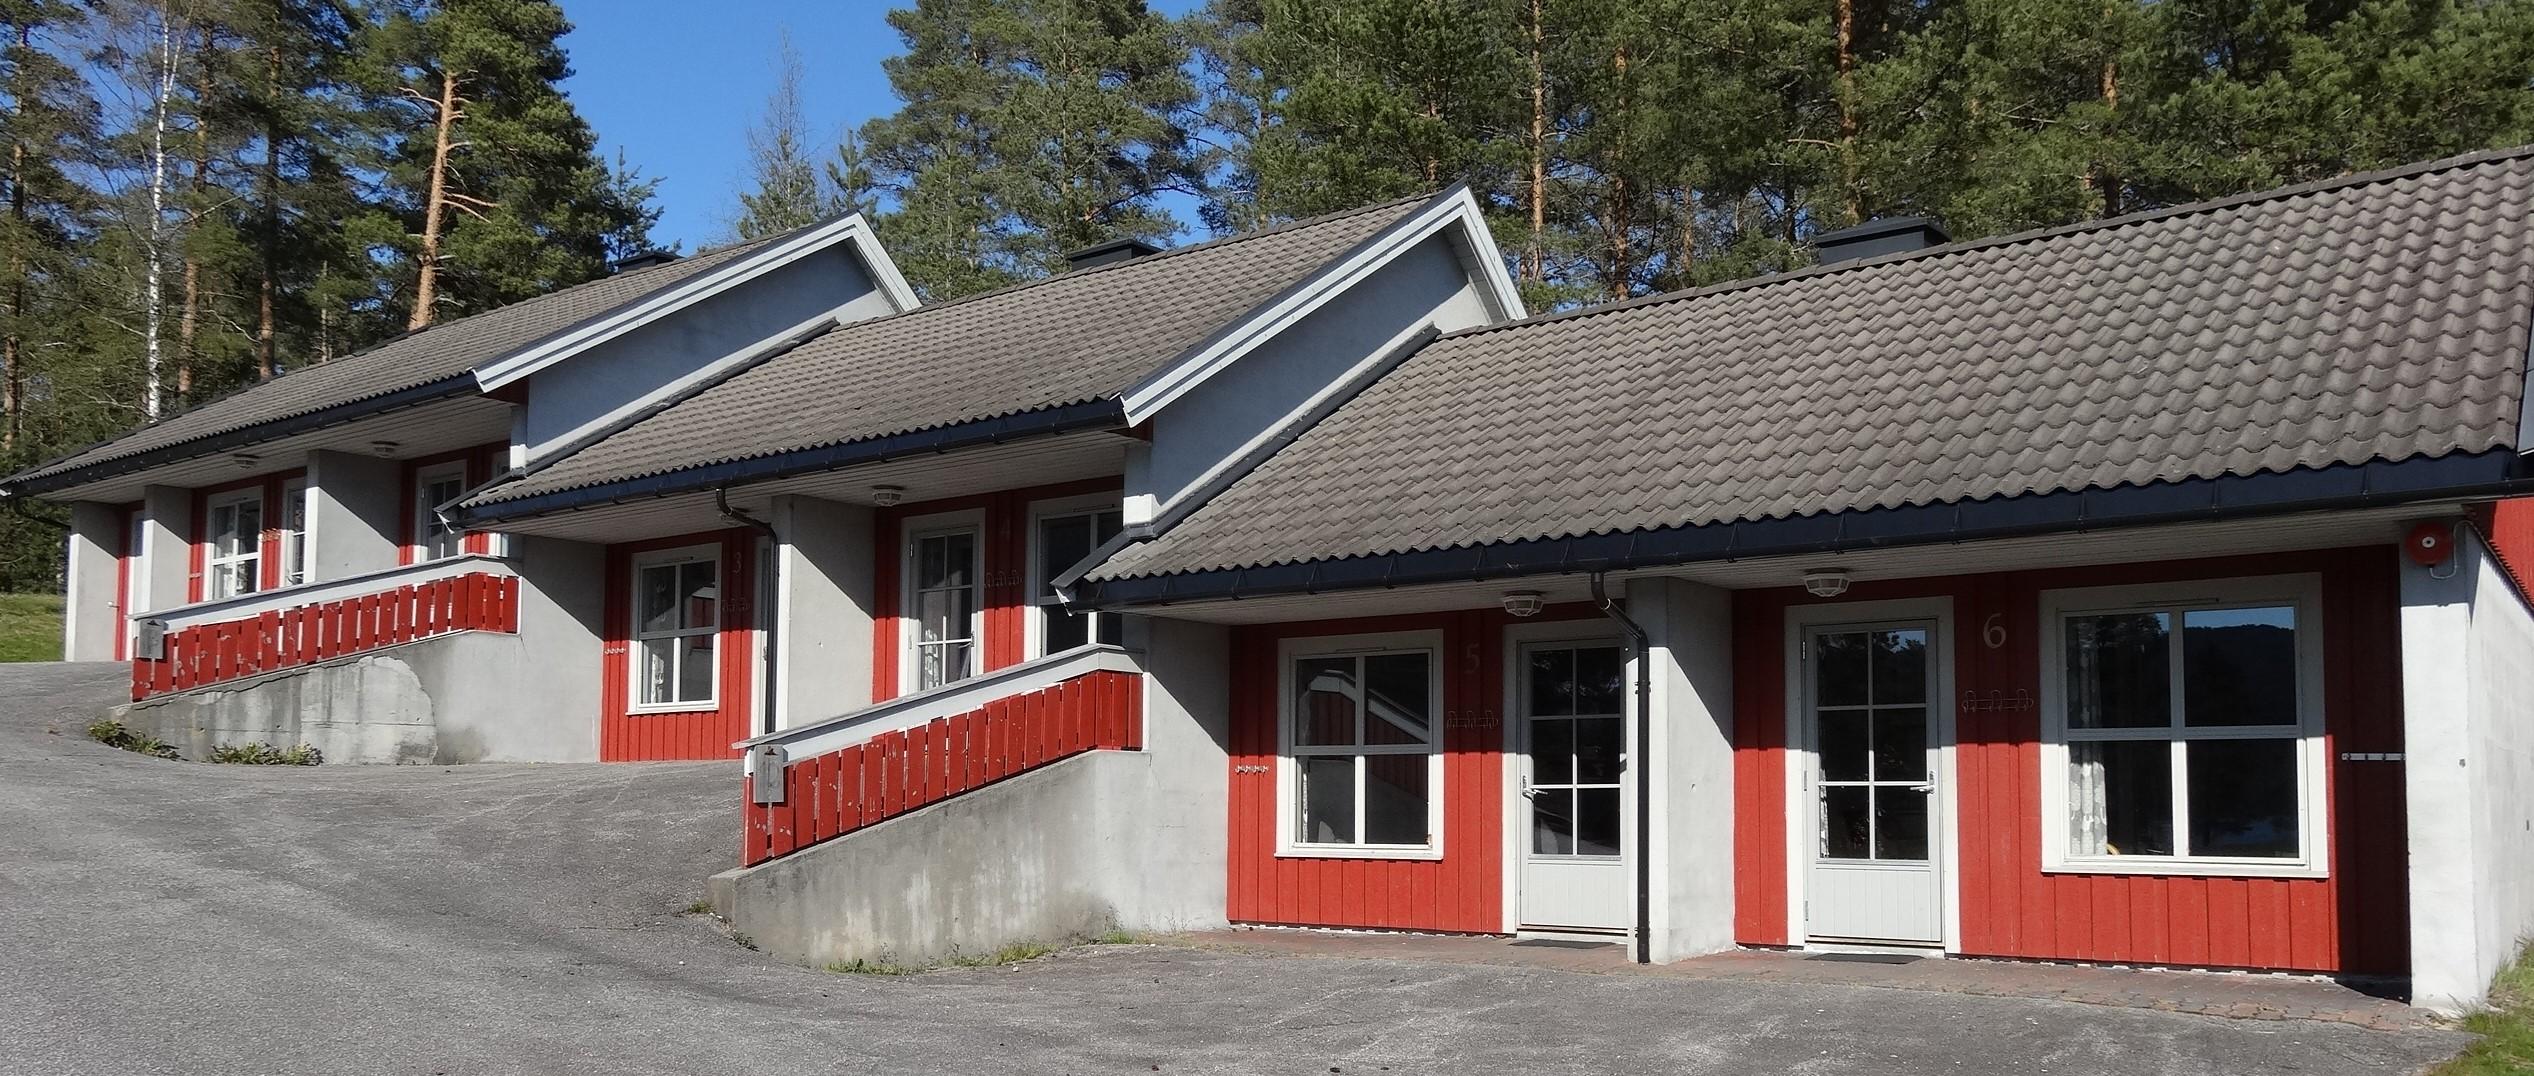 Evjetun Rød hytte, 6 sengs